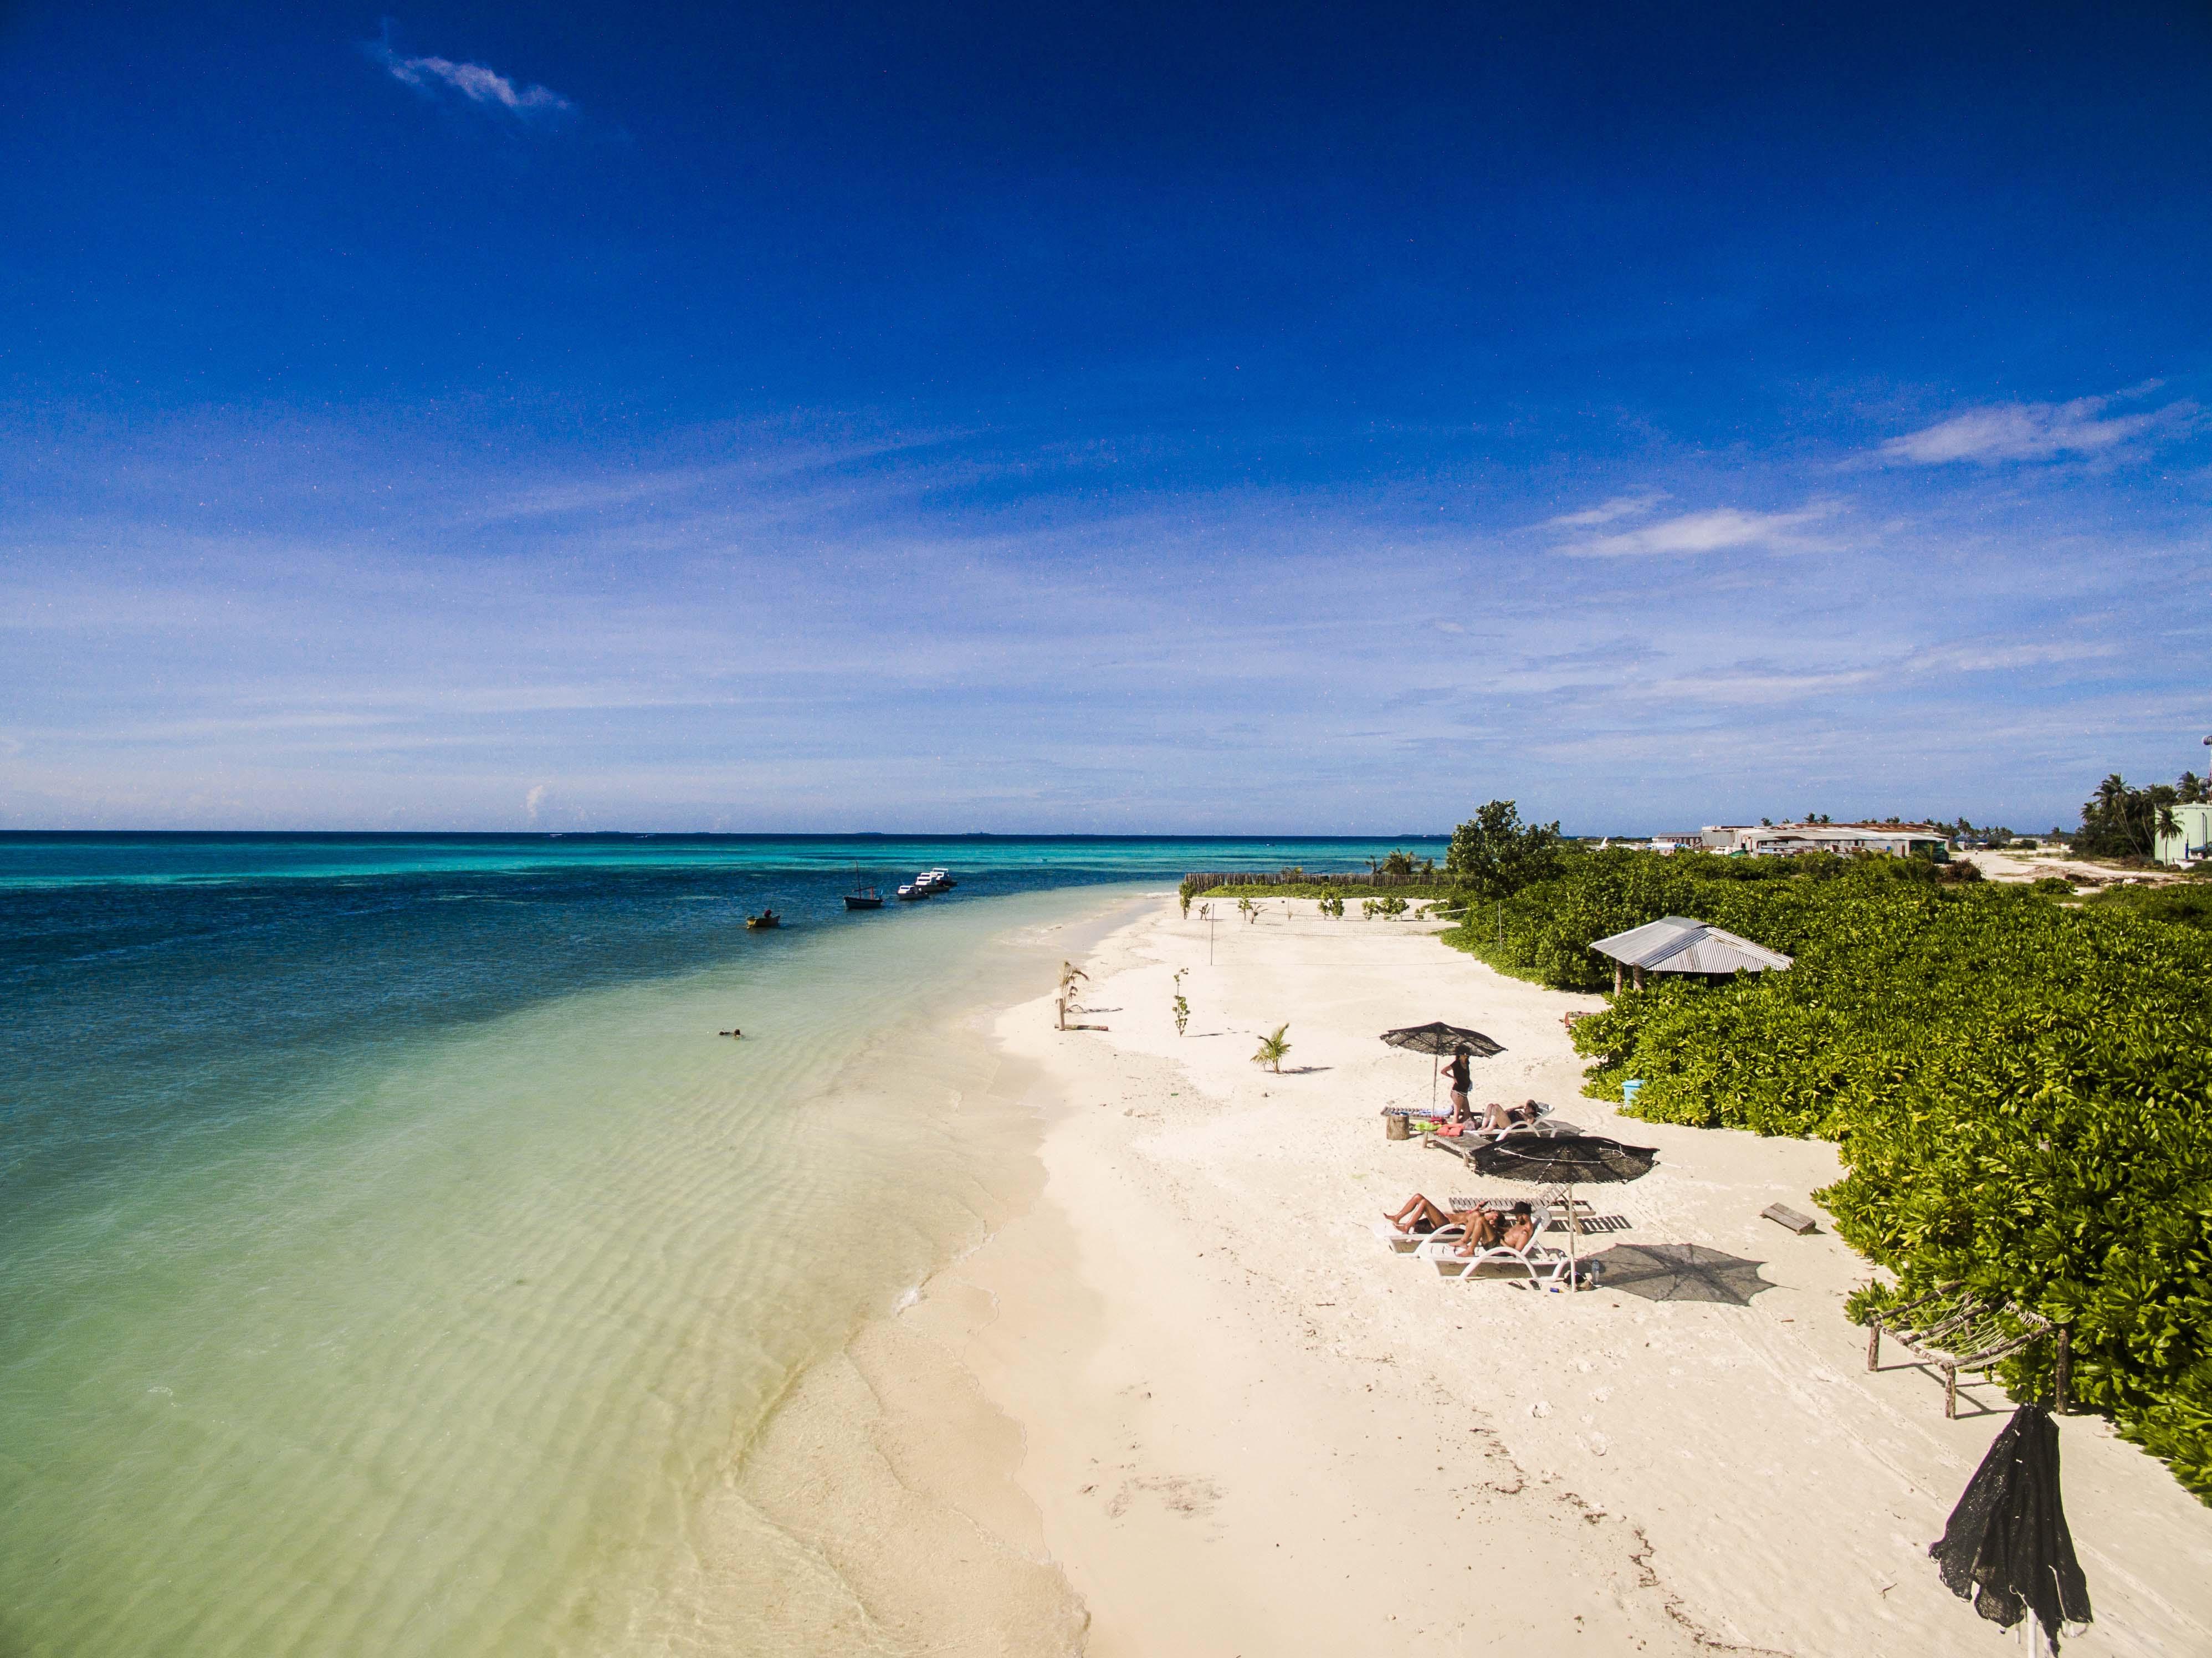 Lacabana Maldives  A Dh Maamigili Island (19)